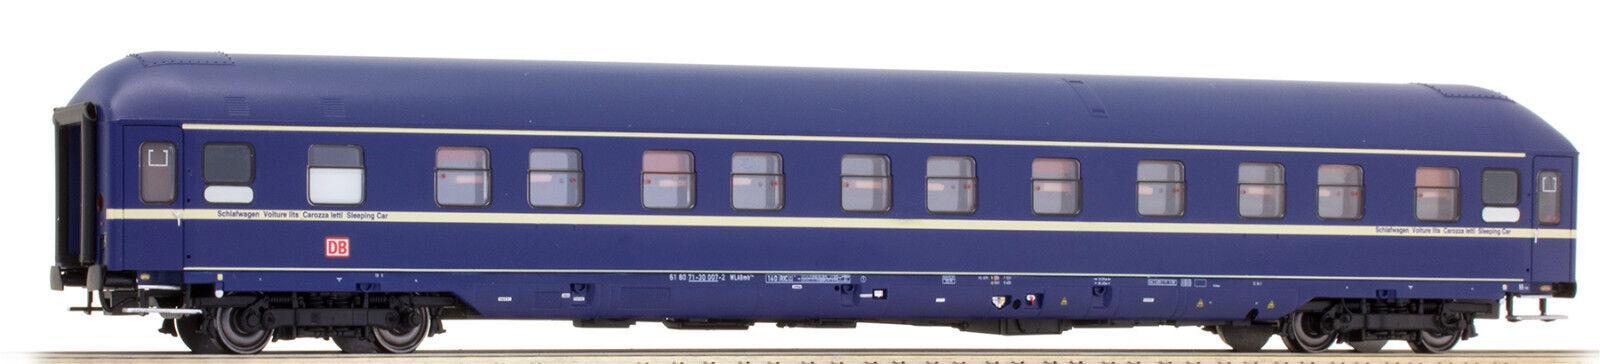 Acme 52374 coche-cama, el wlabmh DB AG PE V h0, blu, 1 87, muy bonito, PVP 72.